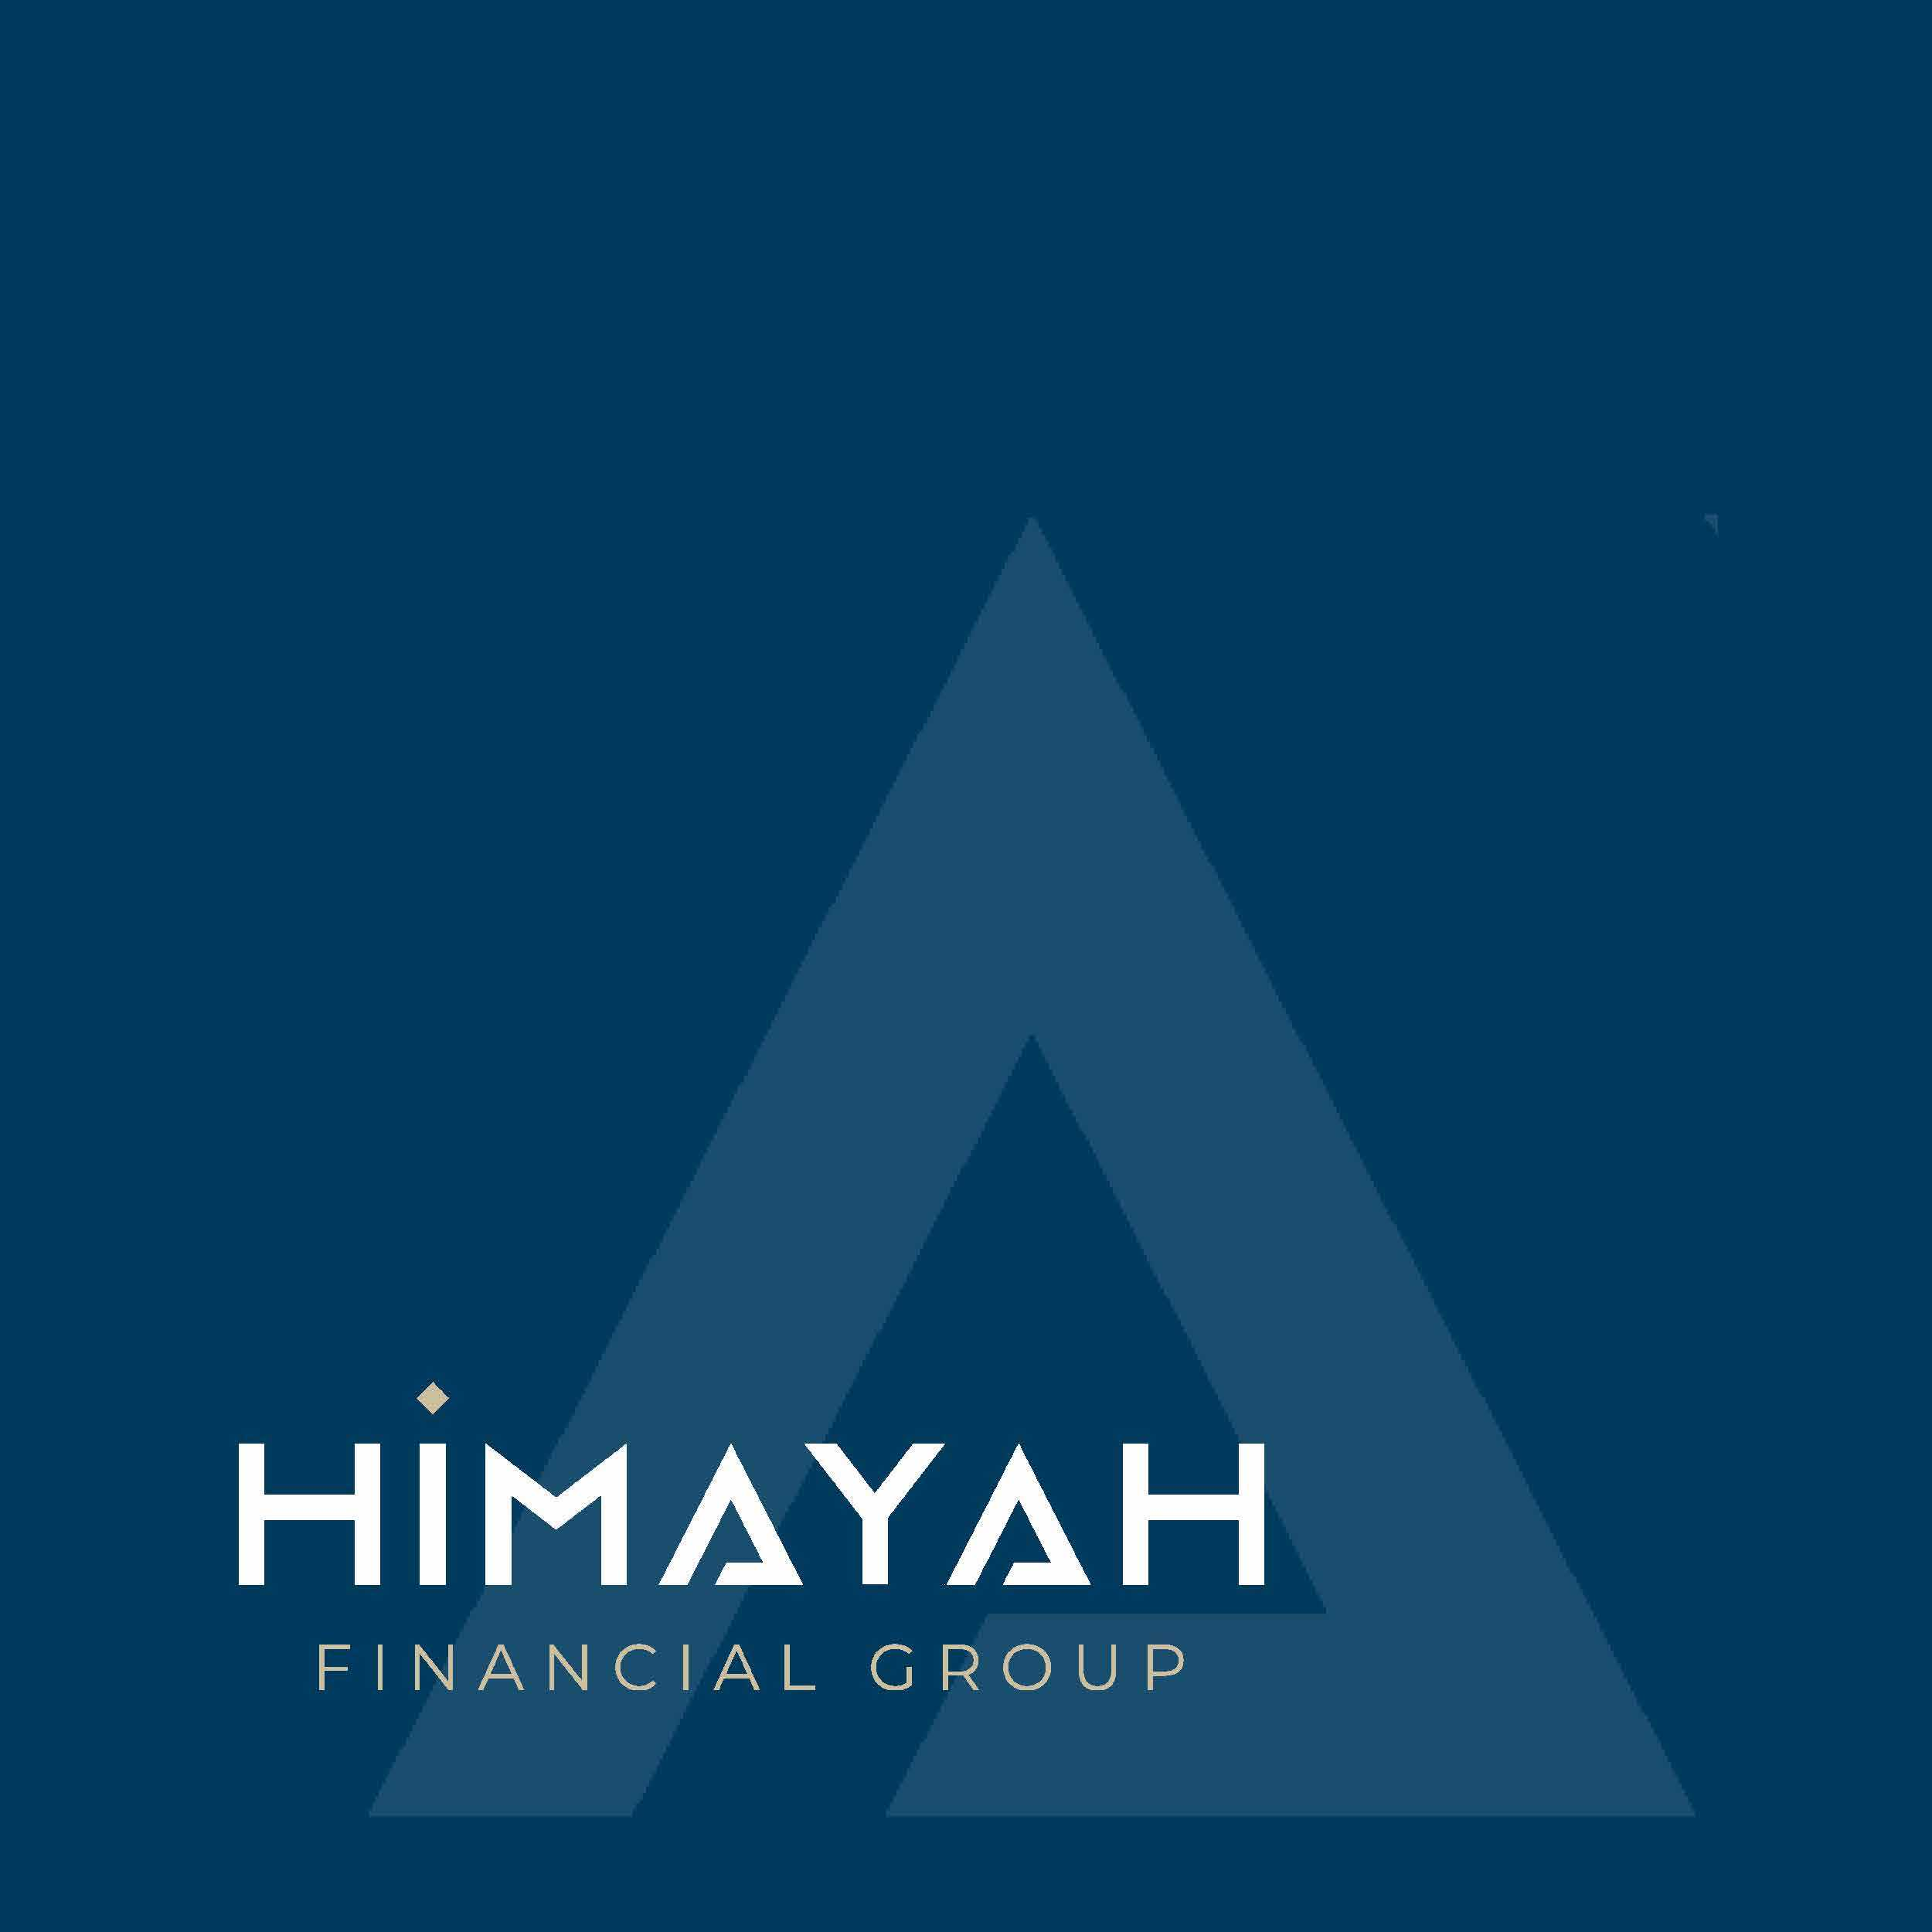 The Himayah logo and logo mark.